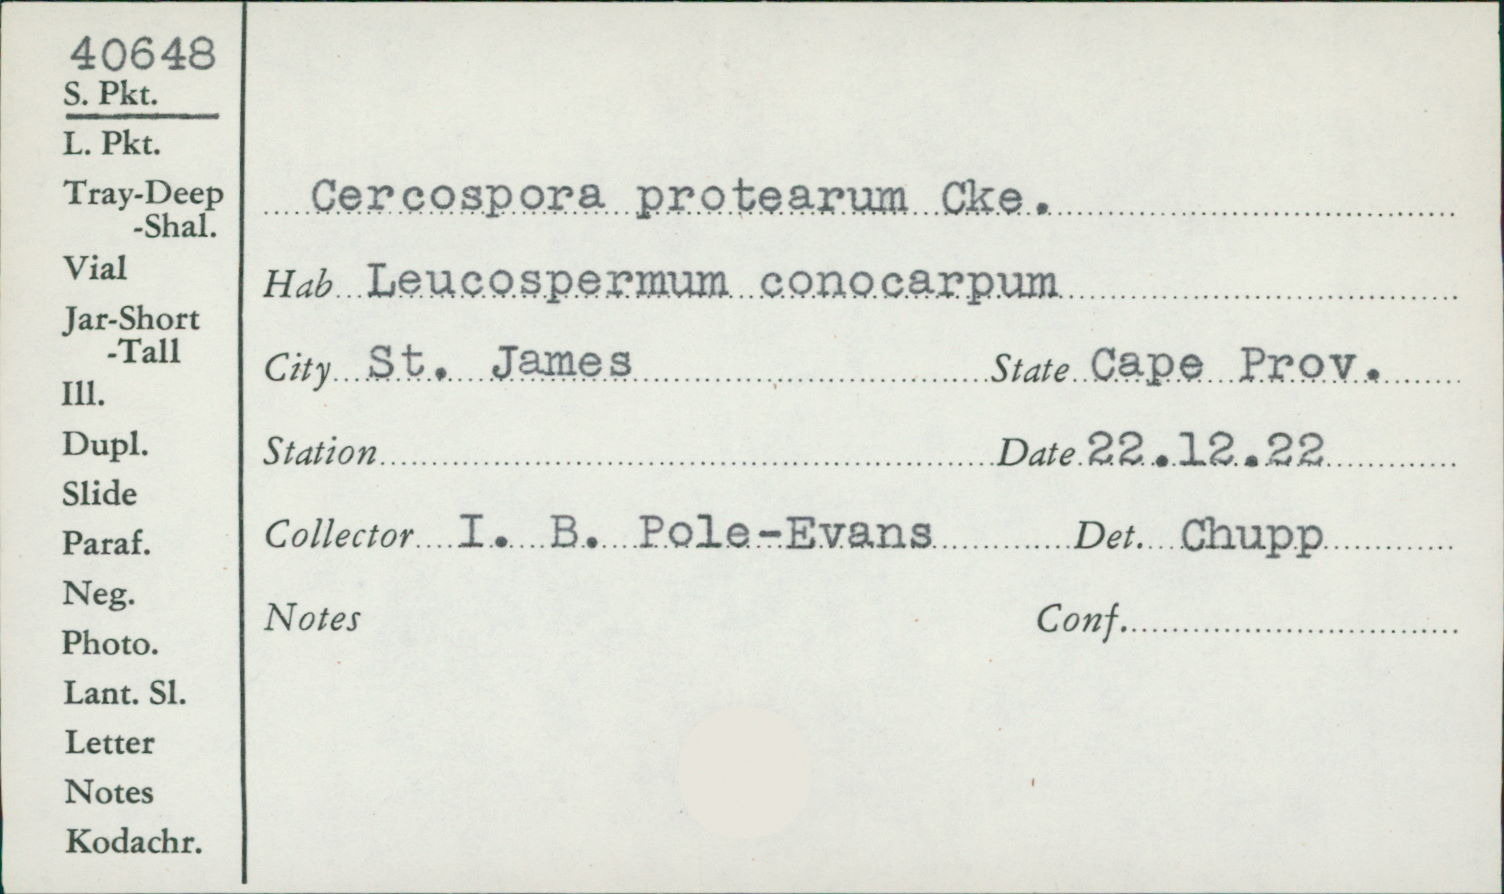 Pseudocercospora protearum image